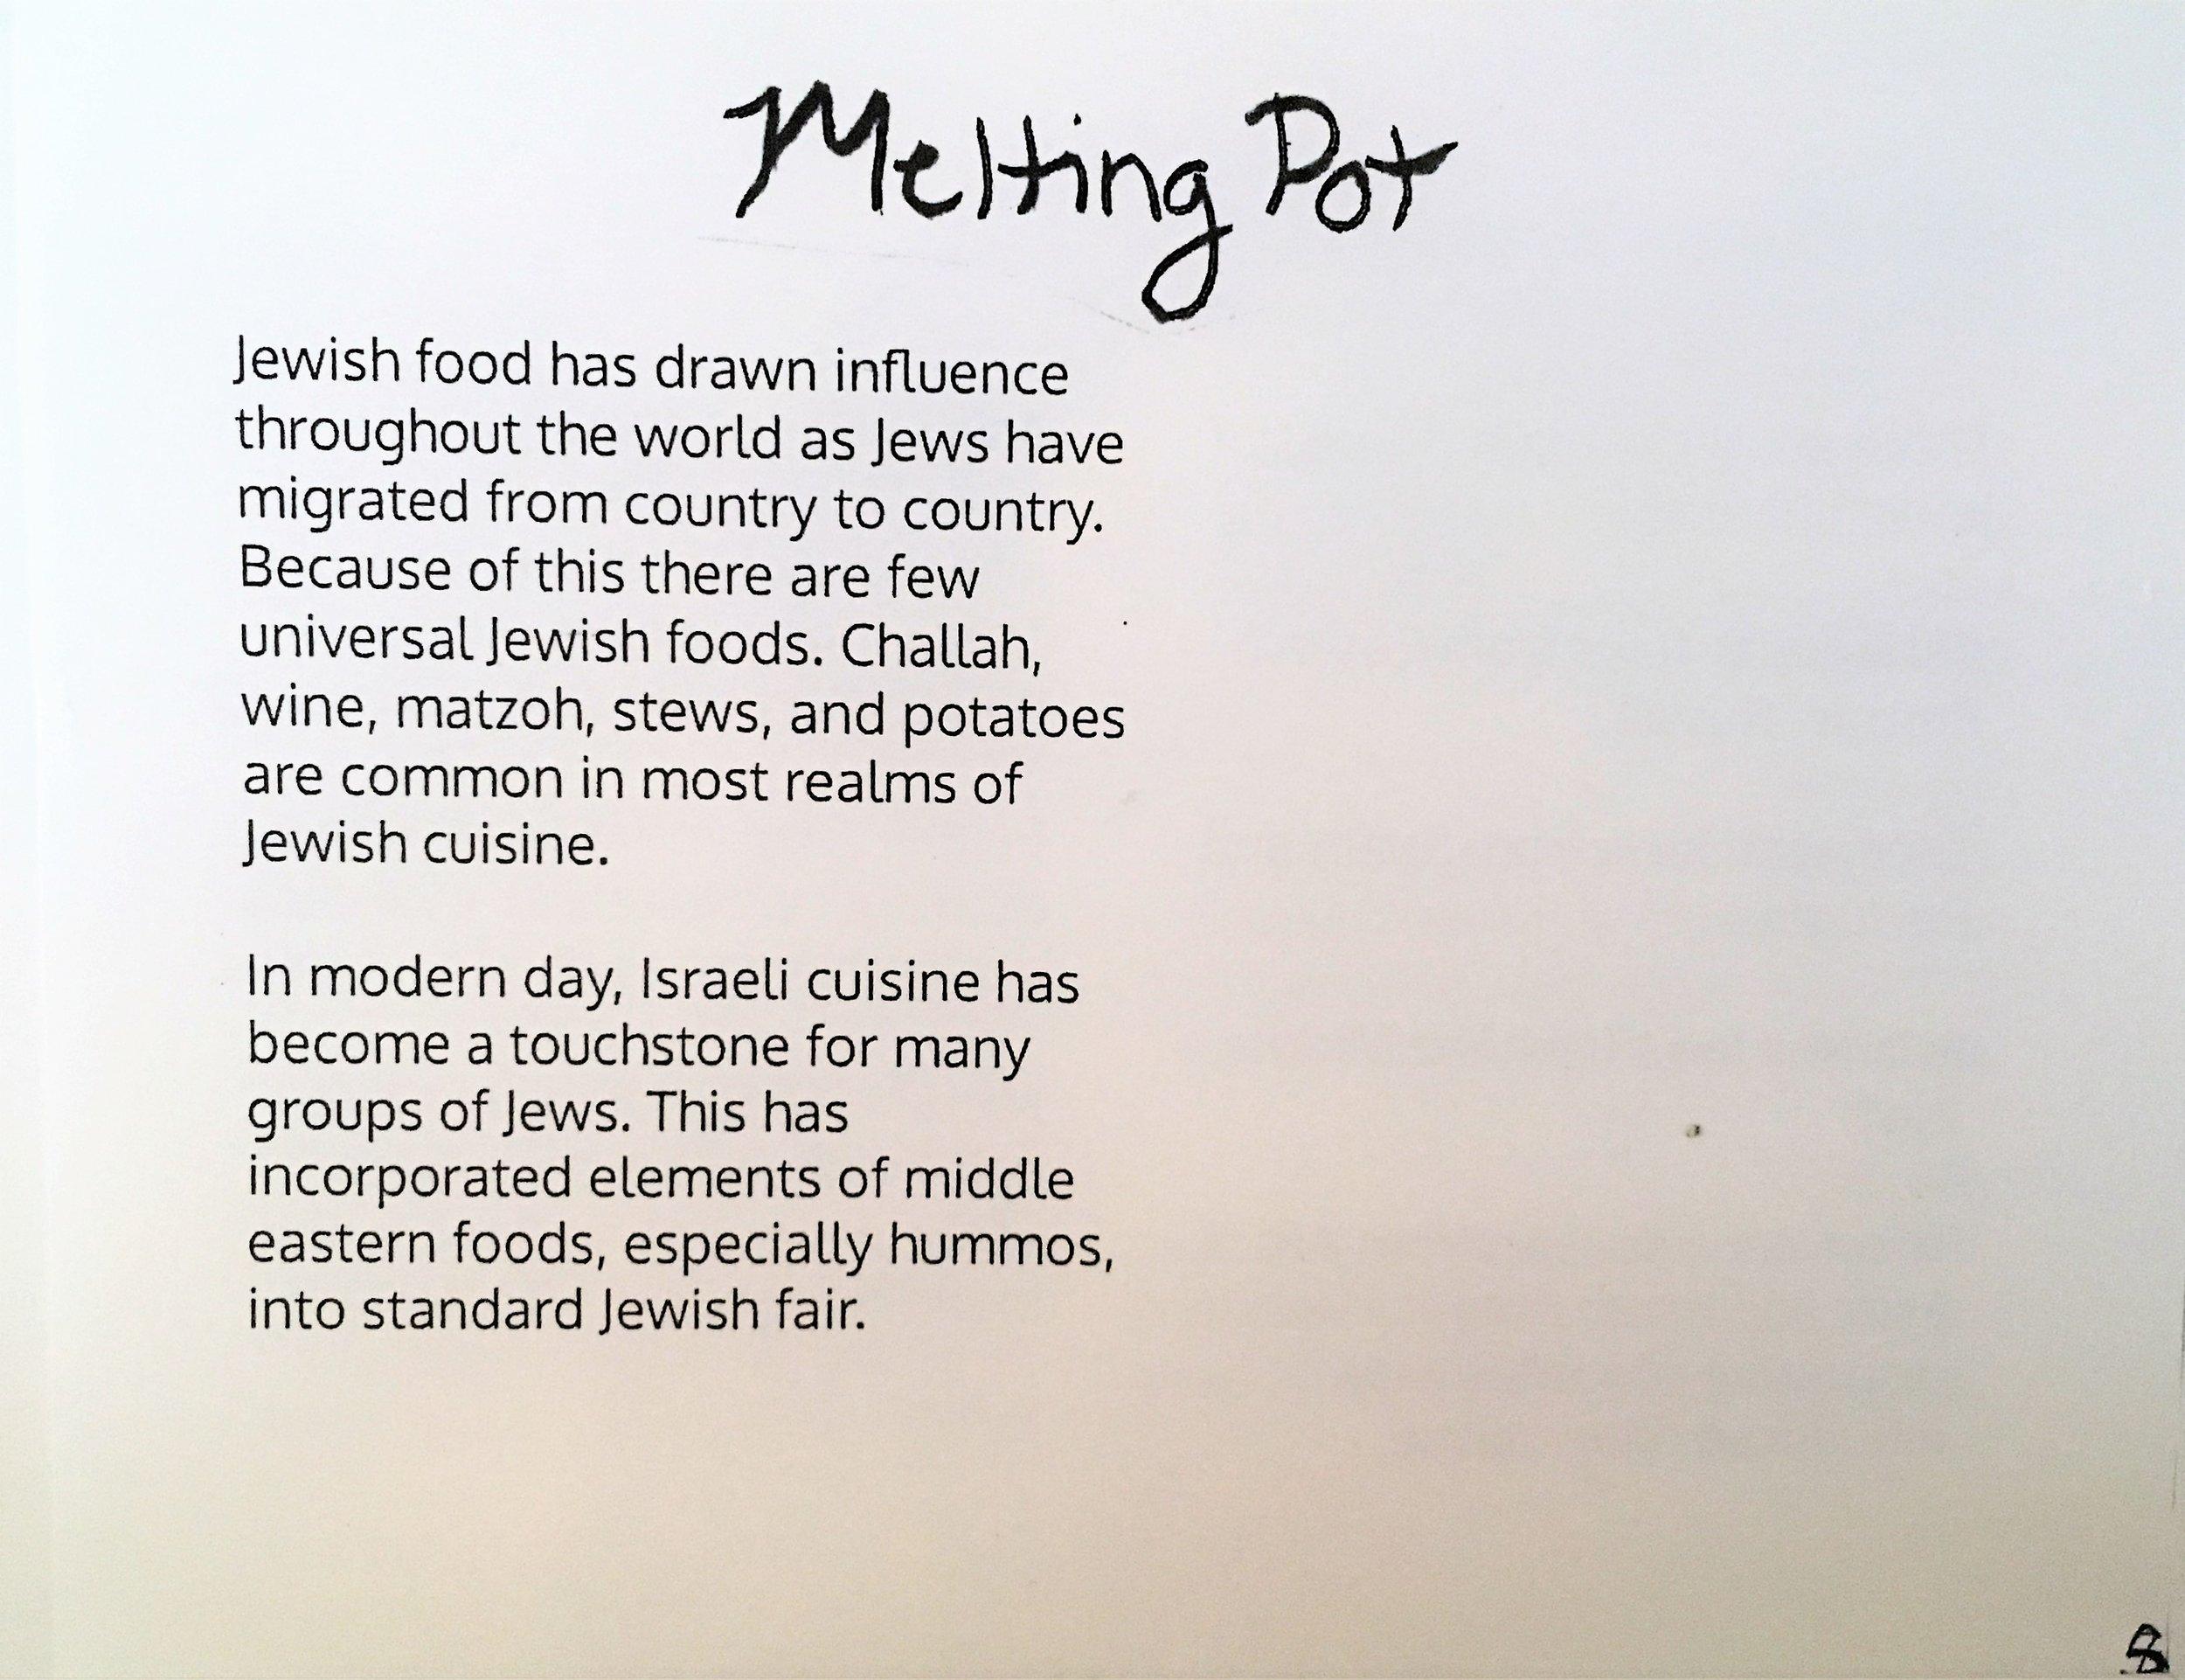 Melting Pot of Jewish Food, inside image